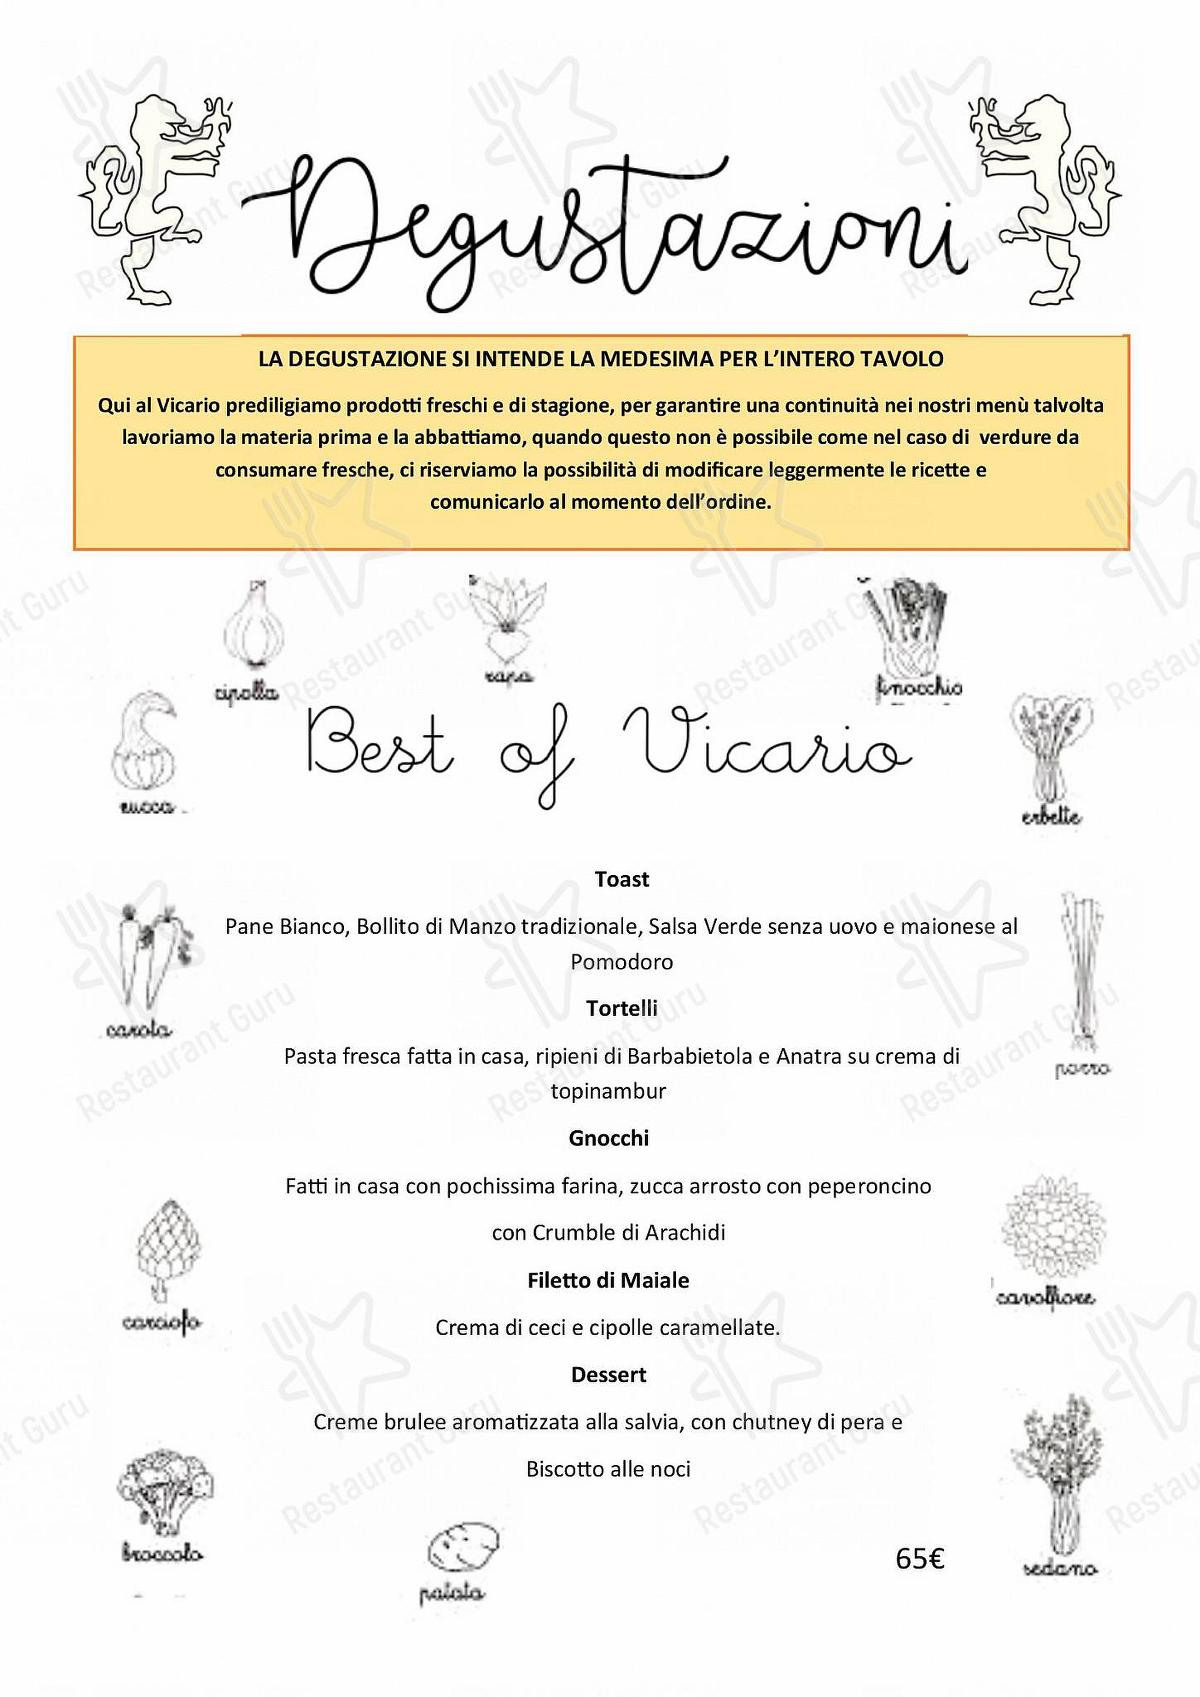 Osteria del Vicario menu - meals and drinks